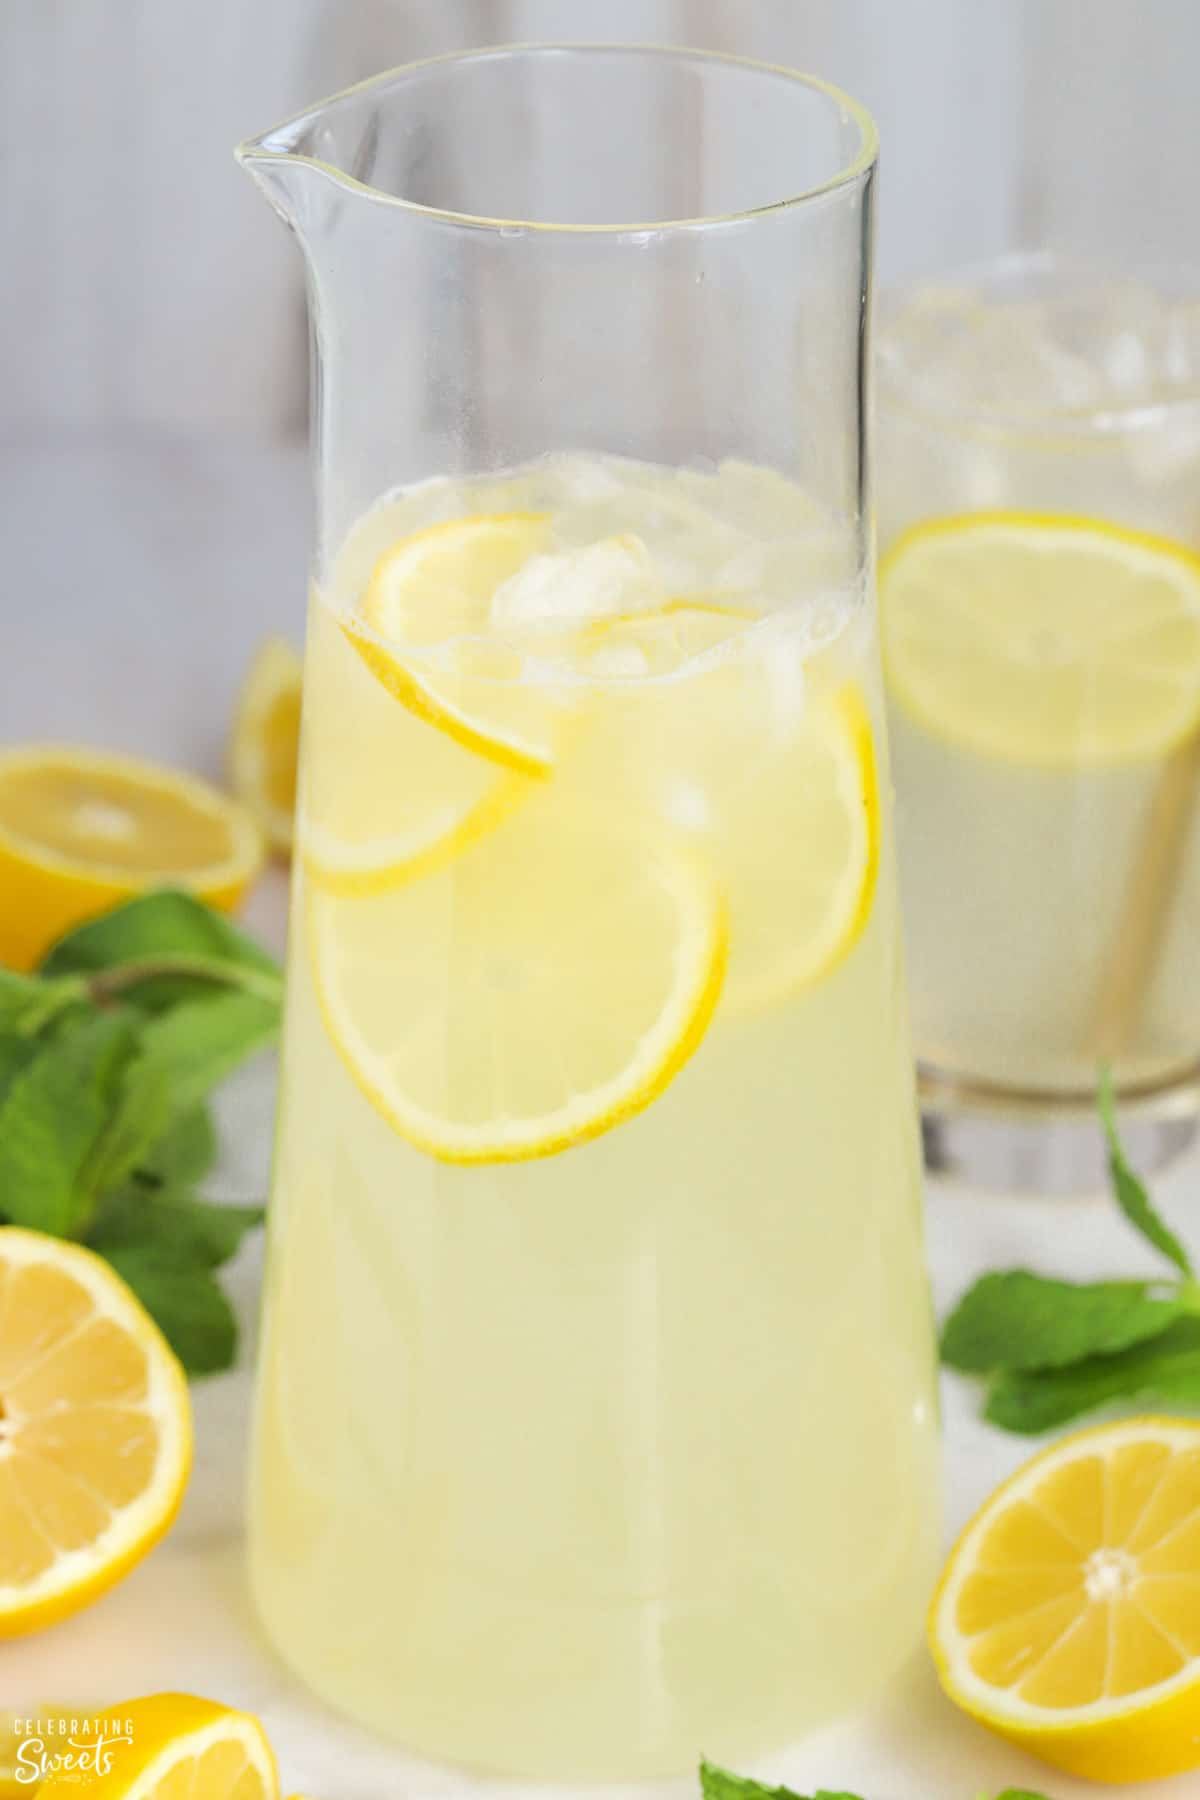 Pitcher of lemonade garnished with fresh lemon.